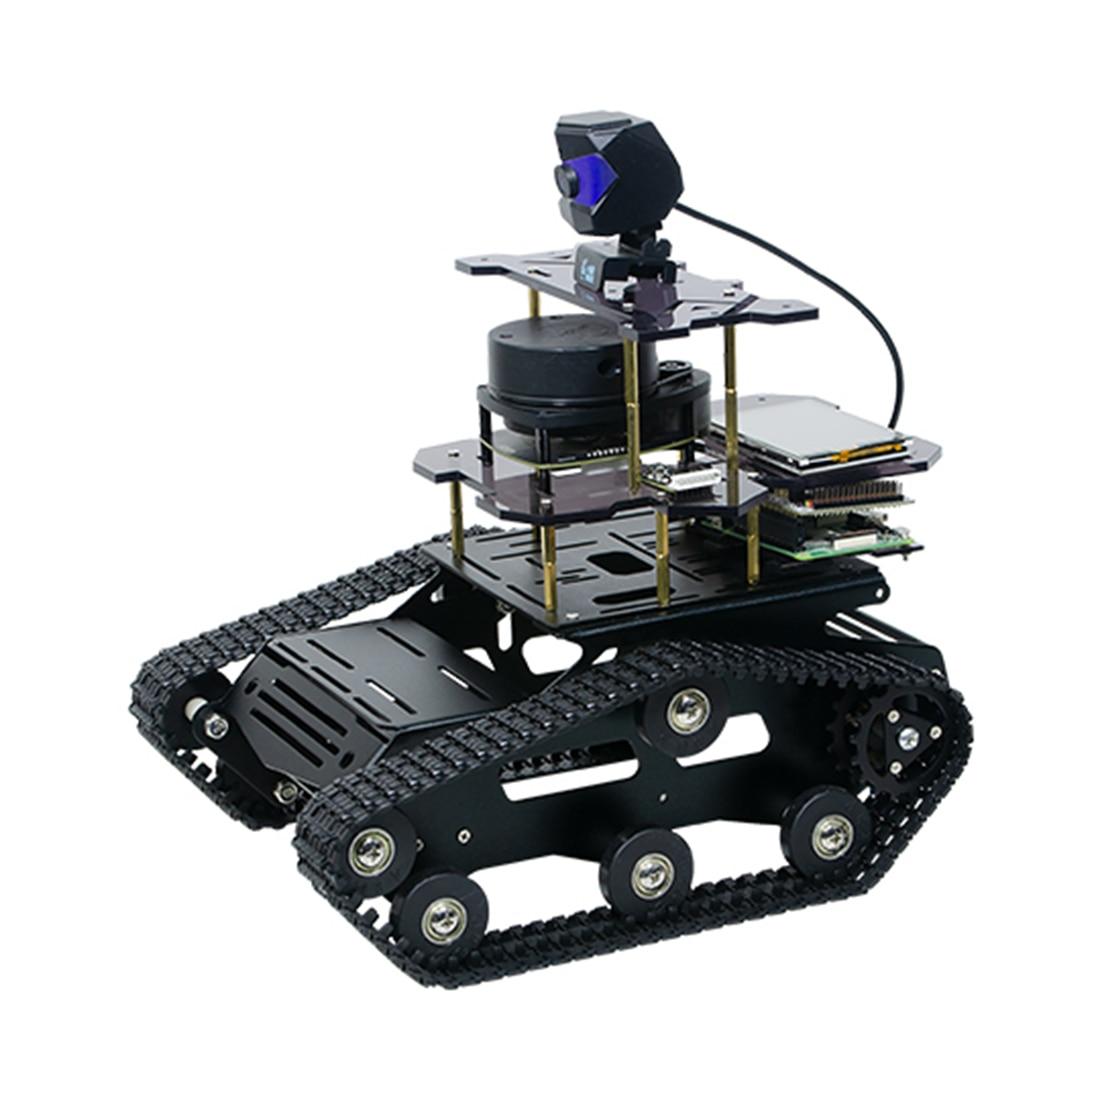 DIY Smart Robot Tank Chassis Car With Laser Radar For Raspberry Pi 4 (2G) For Children Developmental Early Education Toys- Black